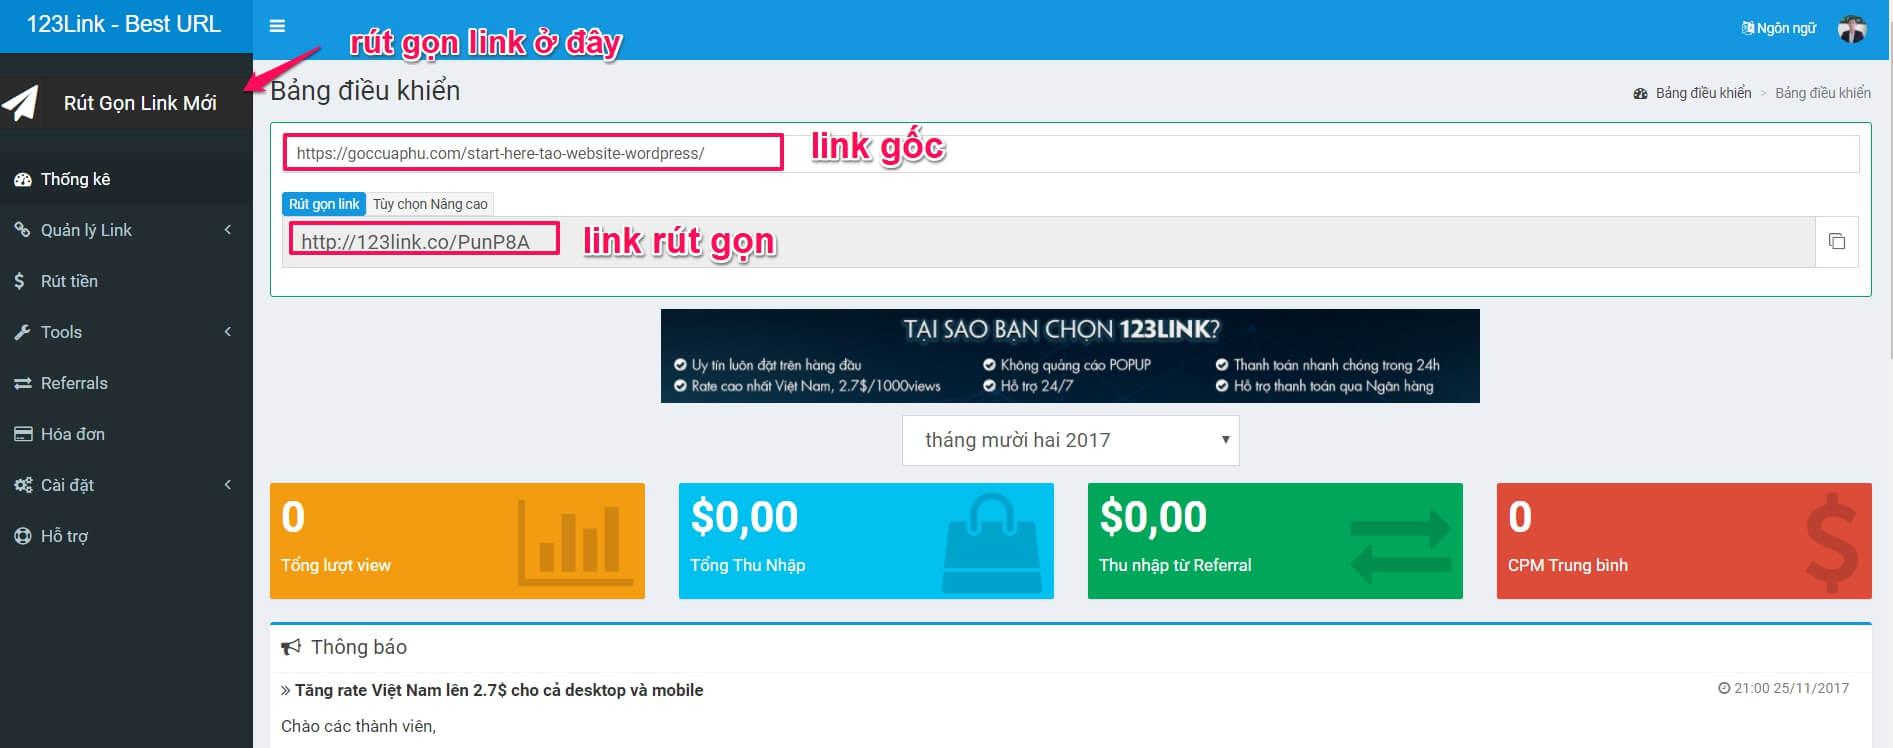 Giao diện trang admin của 123link